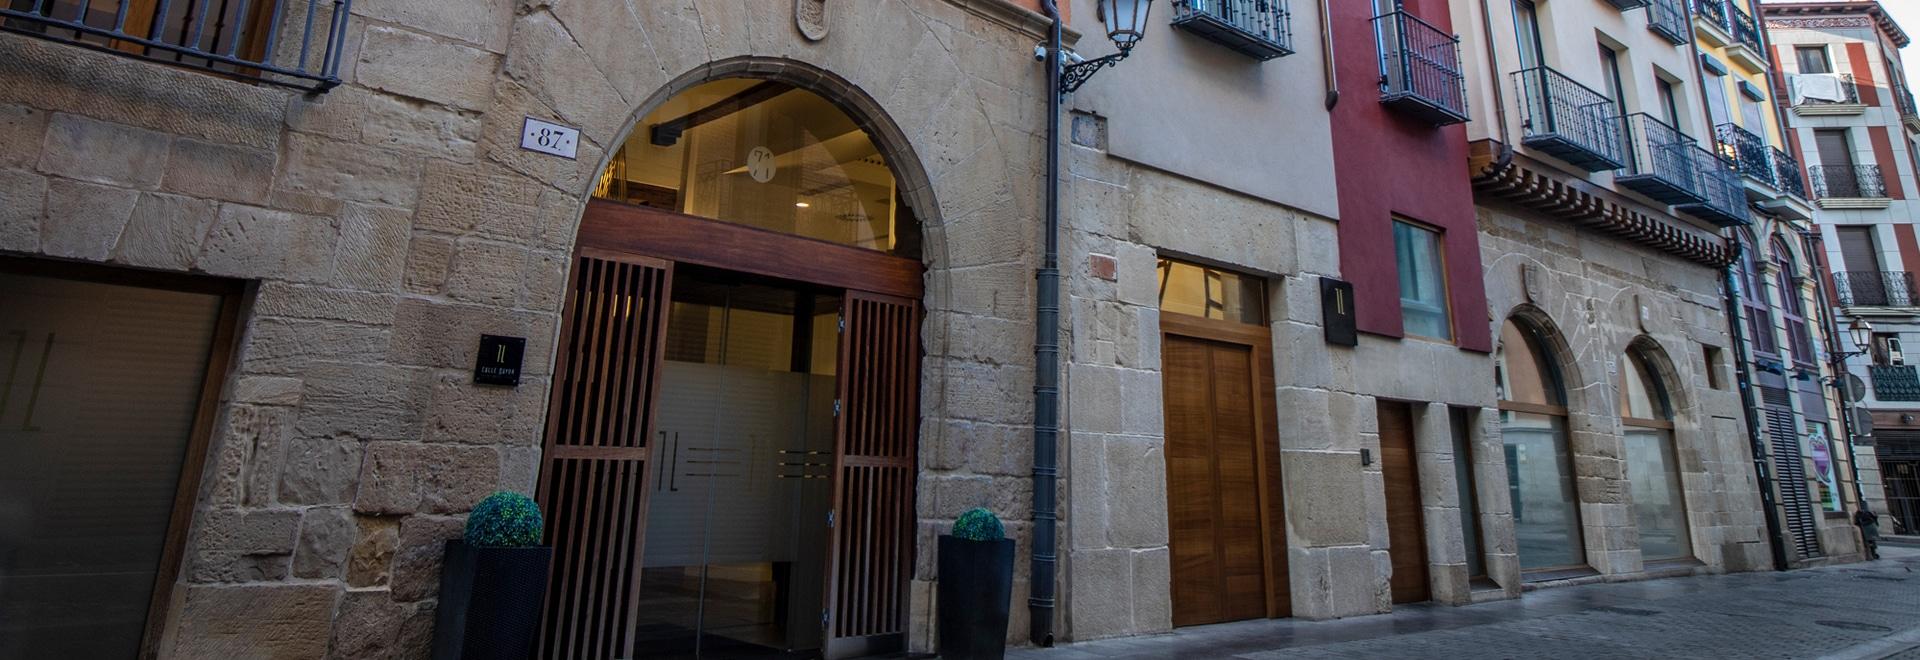 Inalco in Hotel Calle Mayor in La Rioja